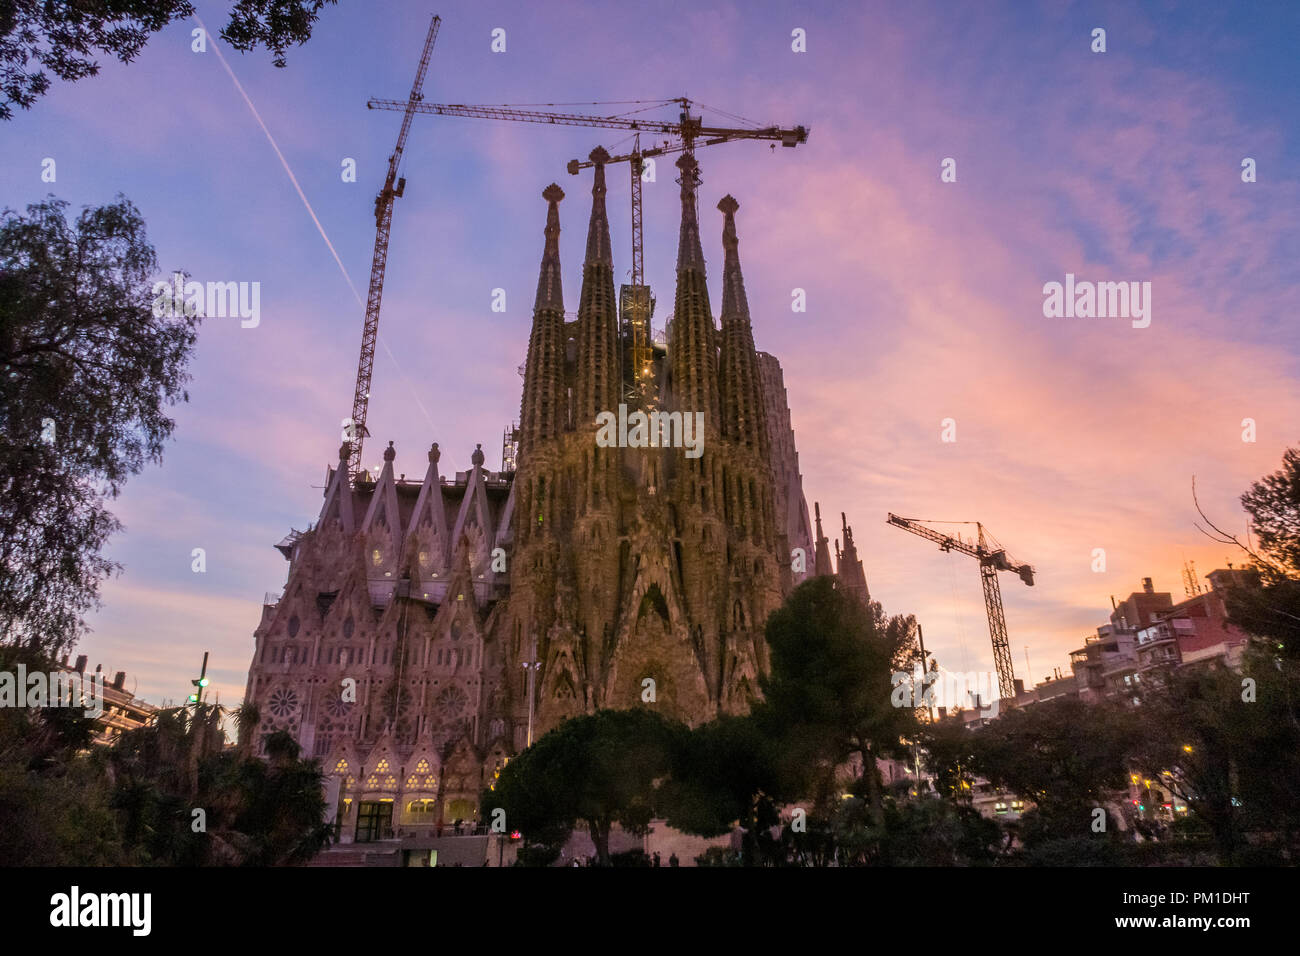 La Sagrada Familia Catholic Church in the Catalan City of Barcelona, Spain.  Designed by Antoni Gaudi the Basilica is still under construction today. Stock Photo